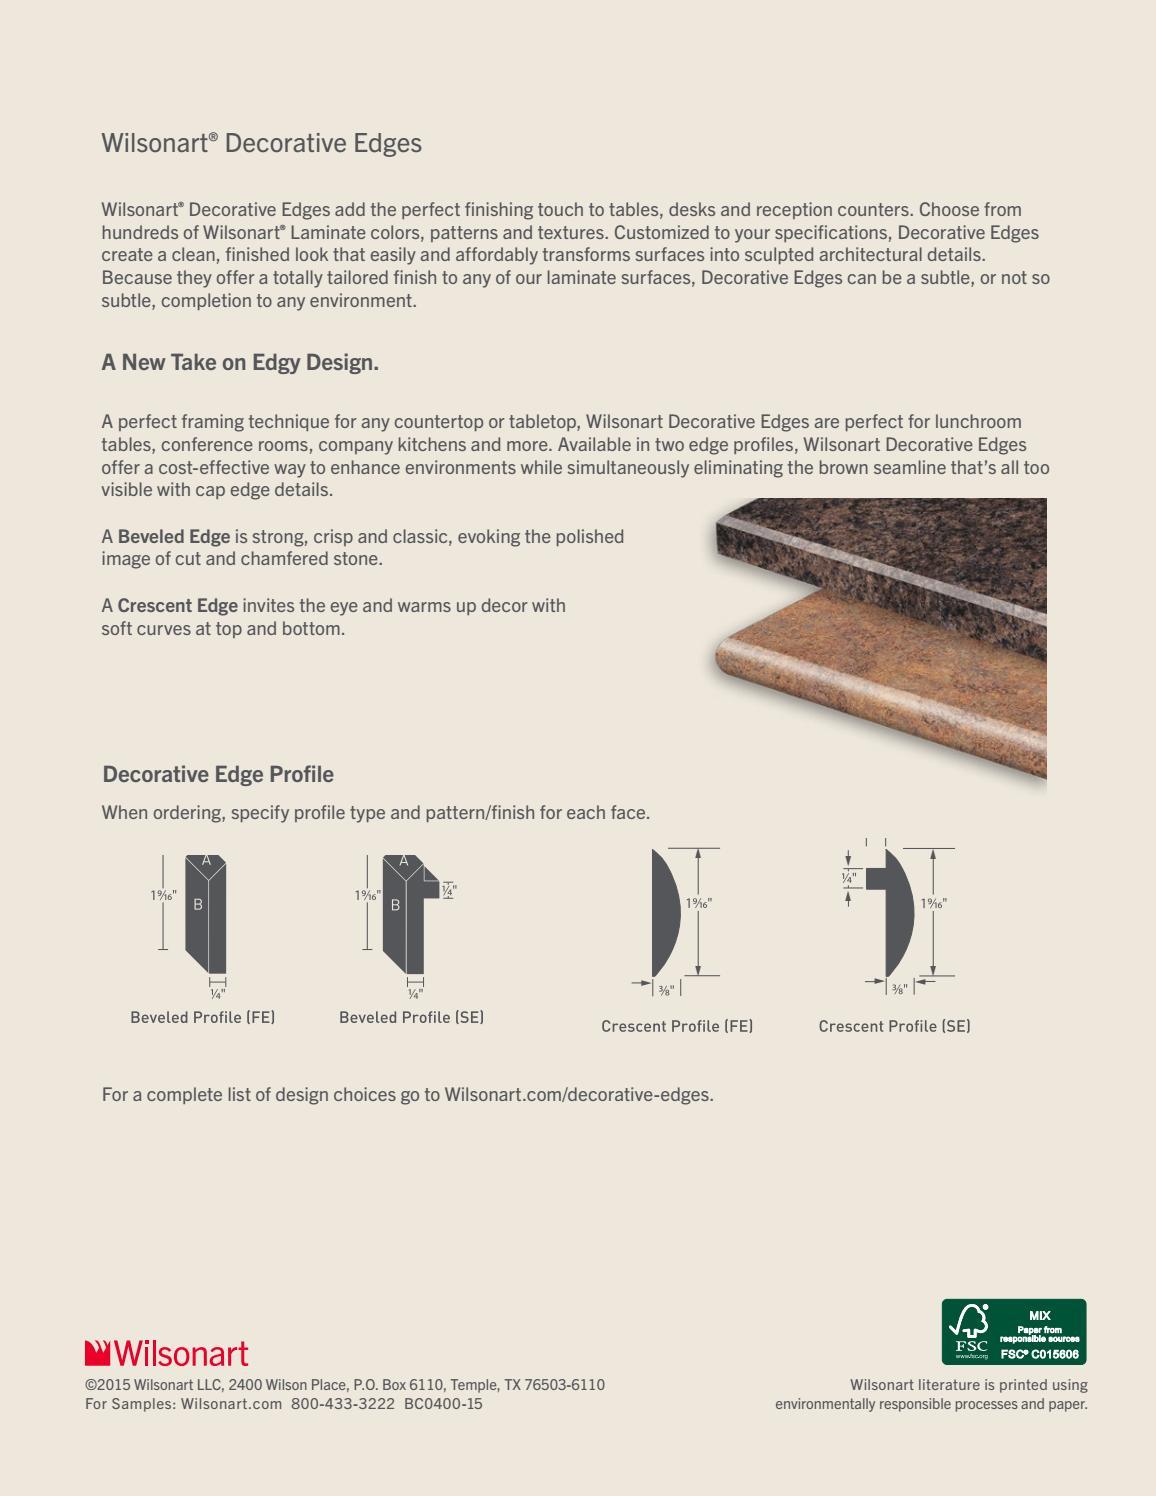 Wilsonart Decorative Edges Brochure By